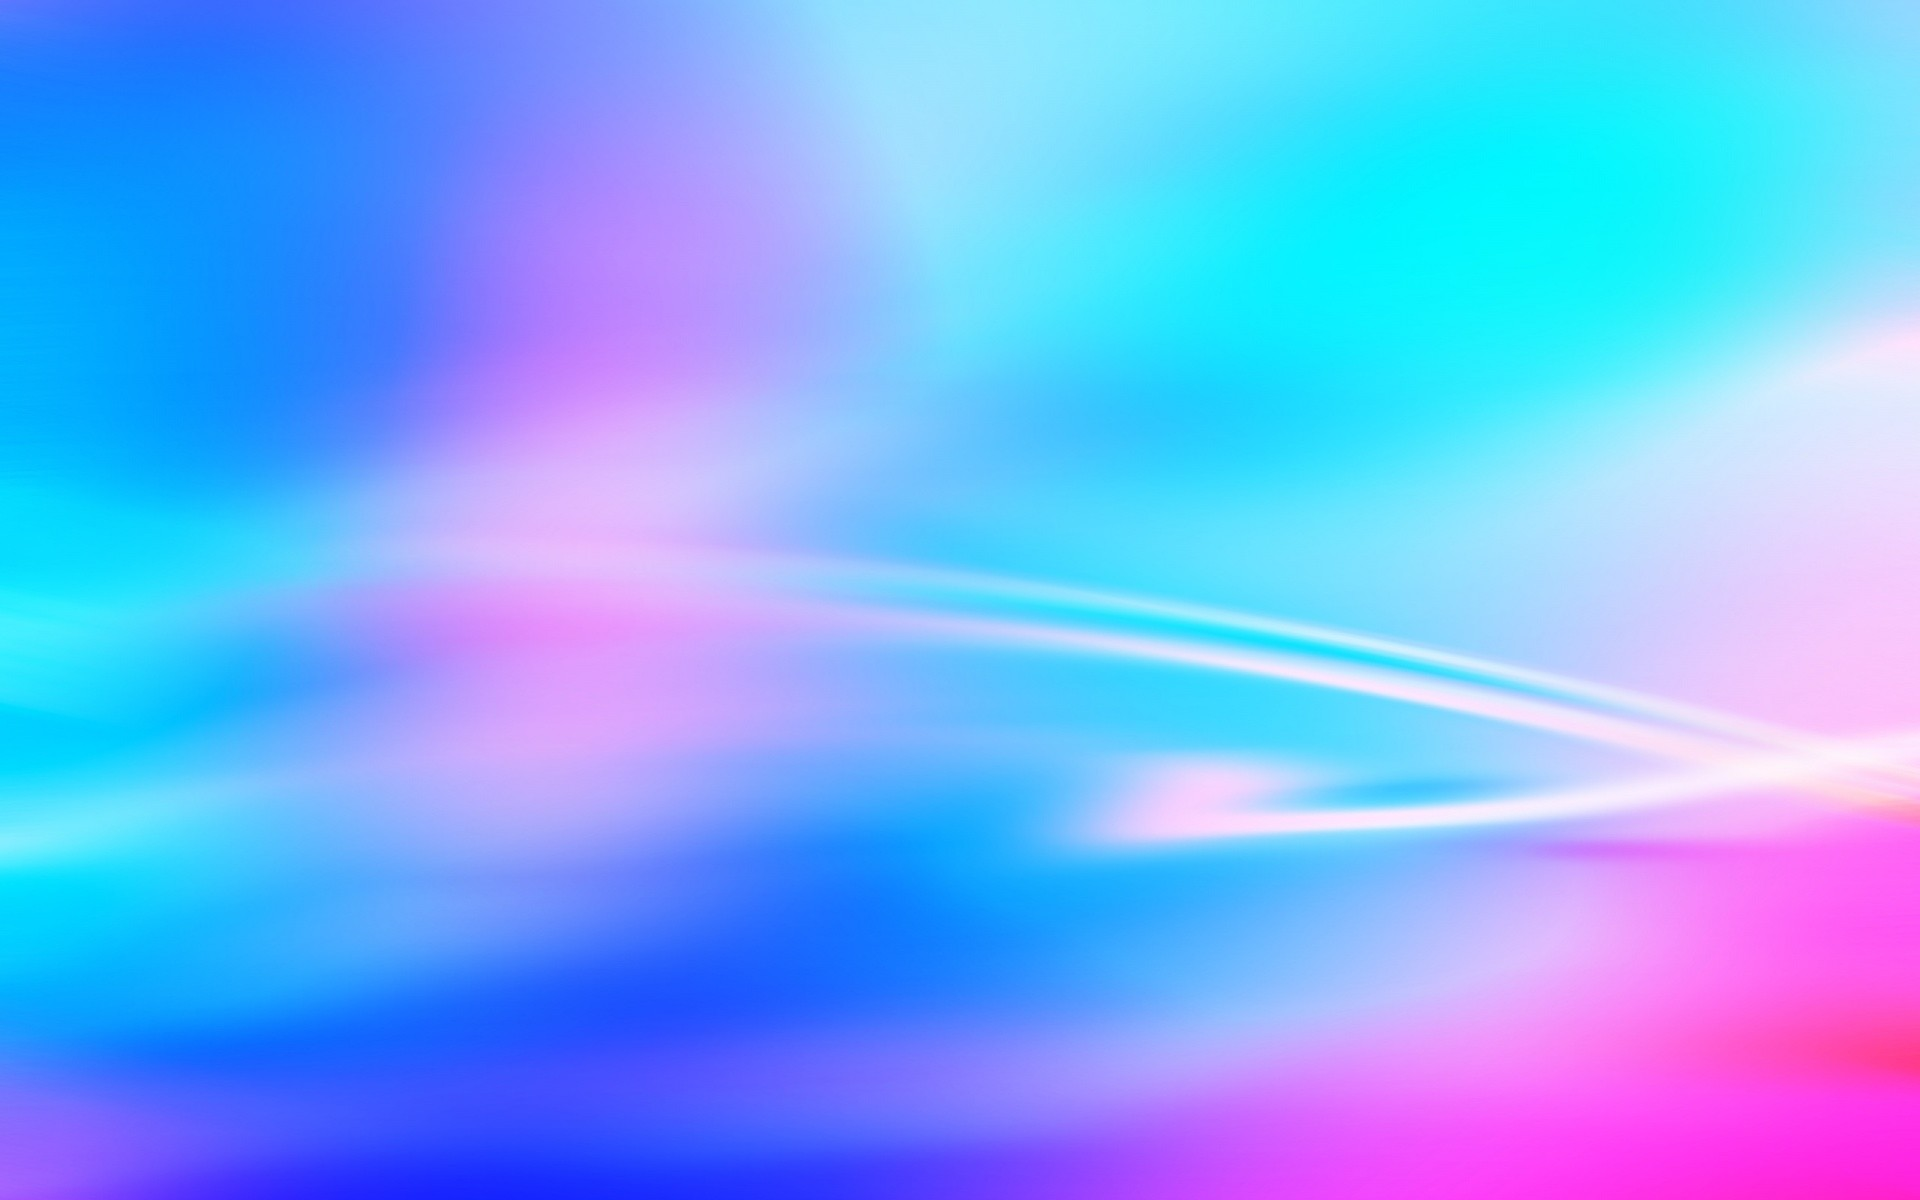 Download Wallpaper Lines, Light, Blue, Pink HD .